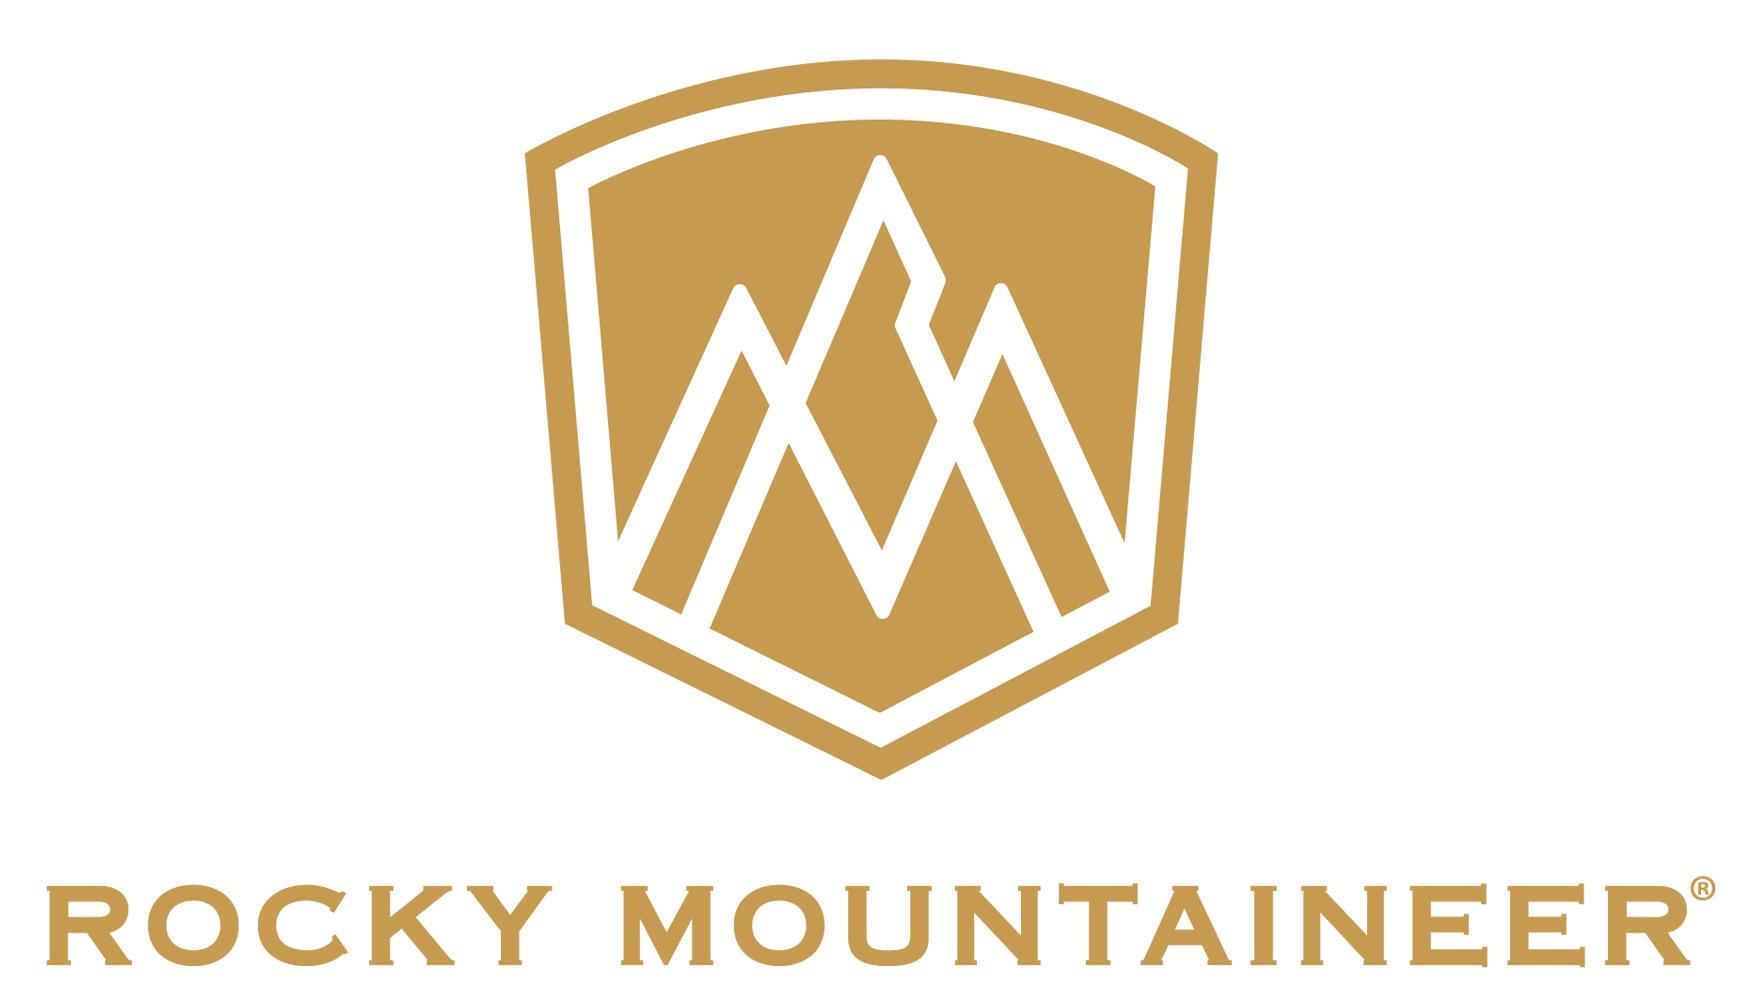 Rocky Mountaineer's